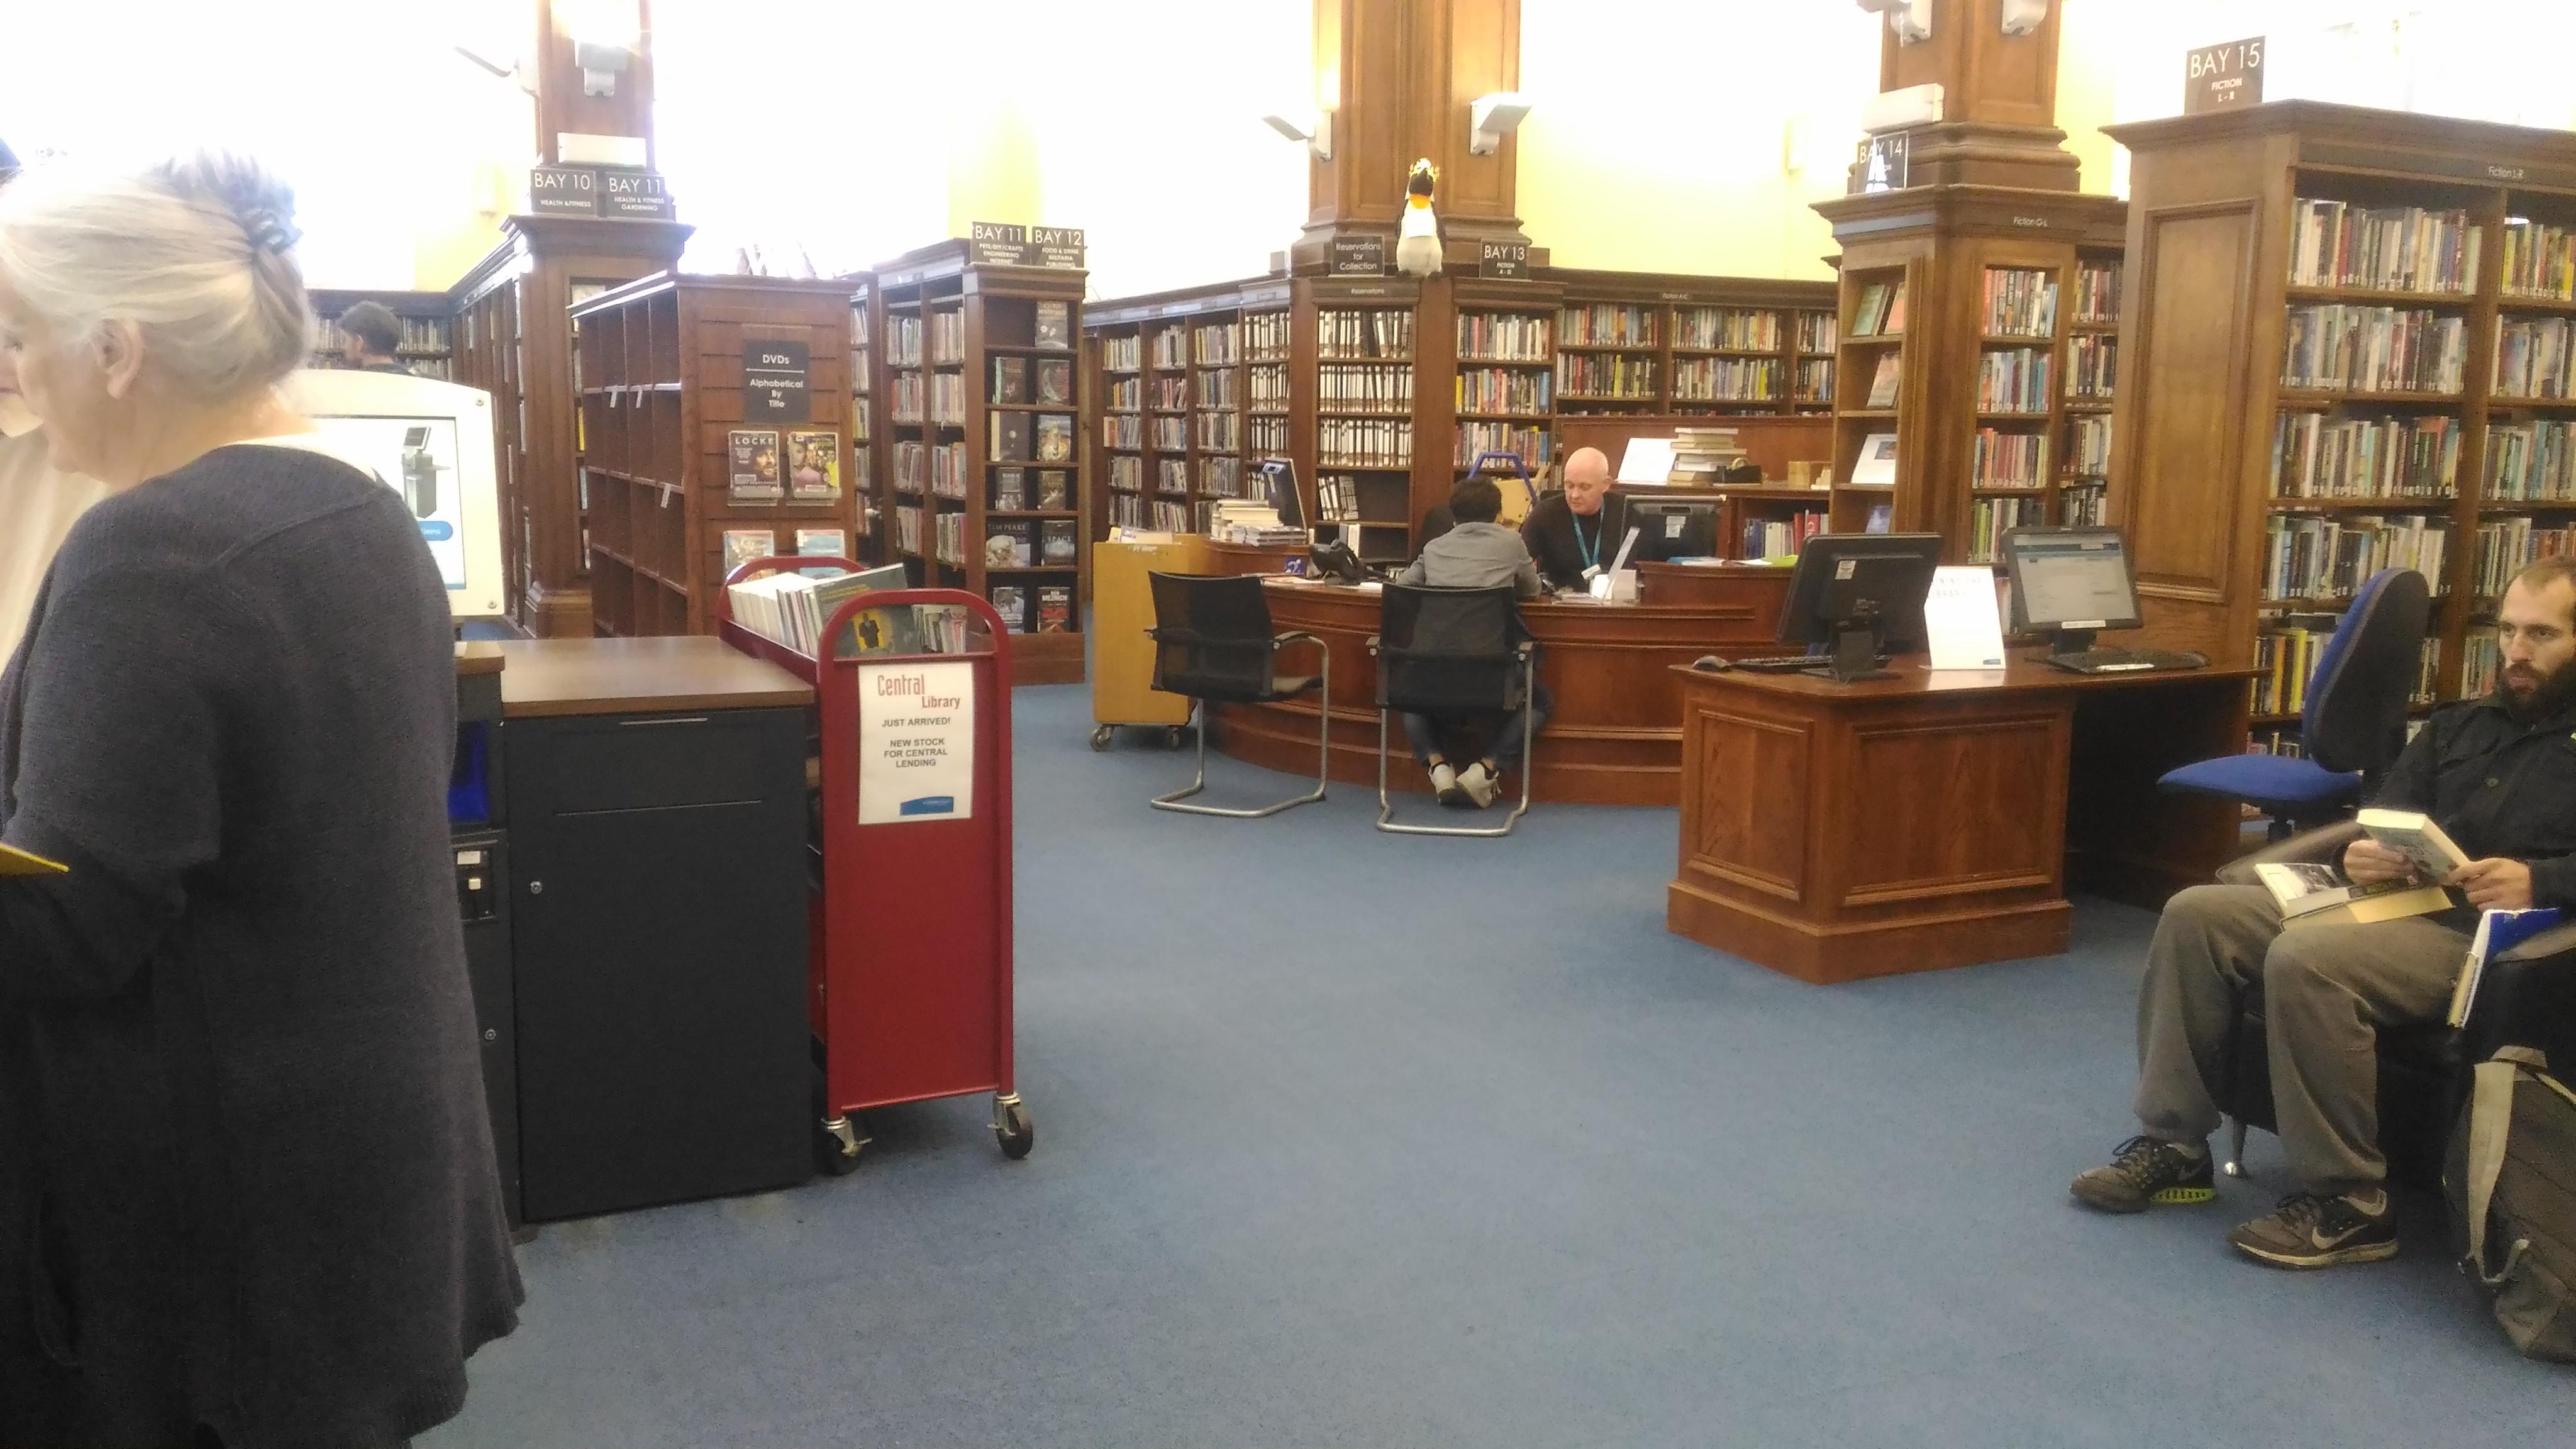 Biblioteca Nacional d'Escòcia, Edimburg. Fotografia© Josep Maria Aymà Aubeyzon